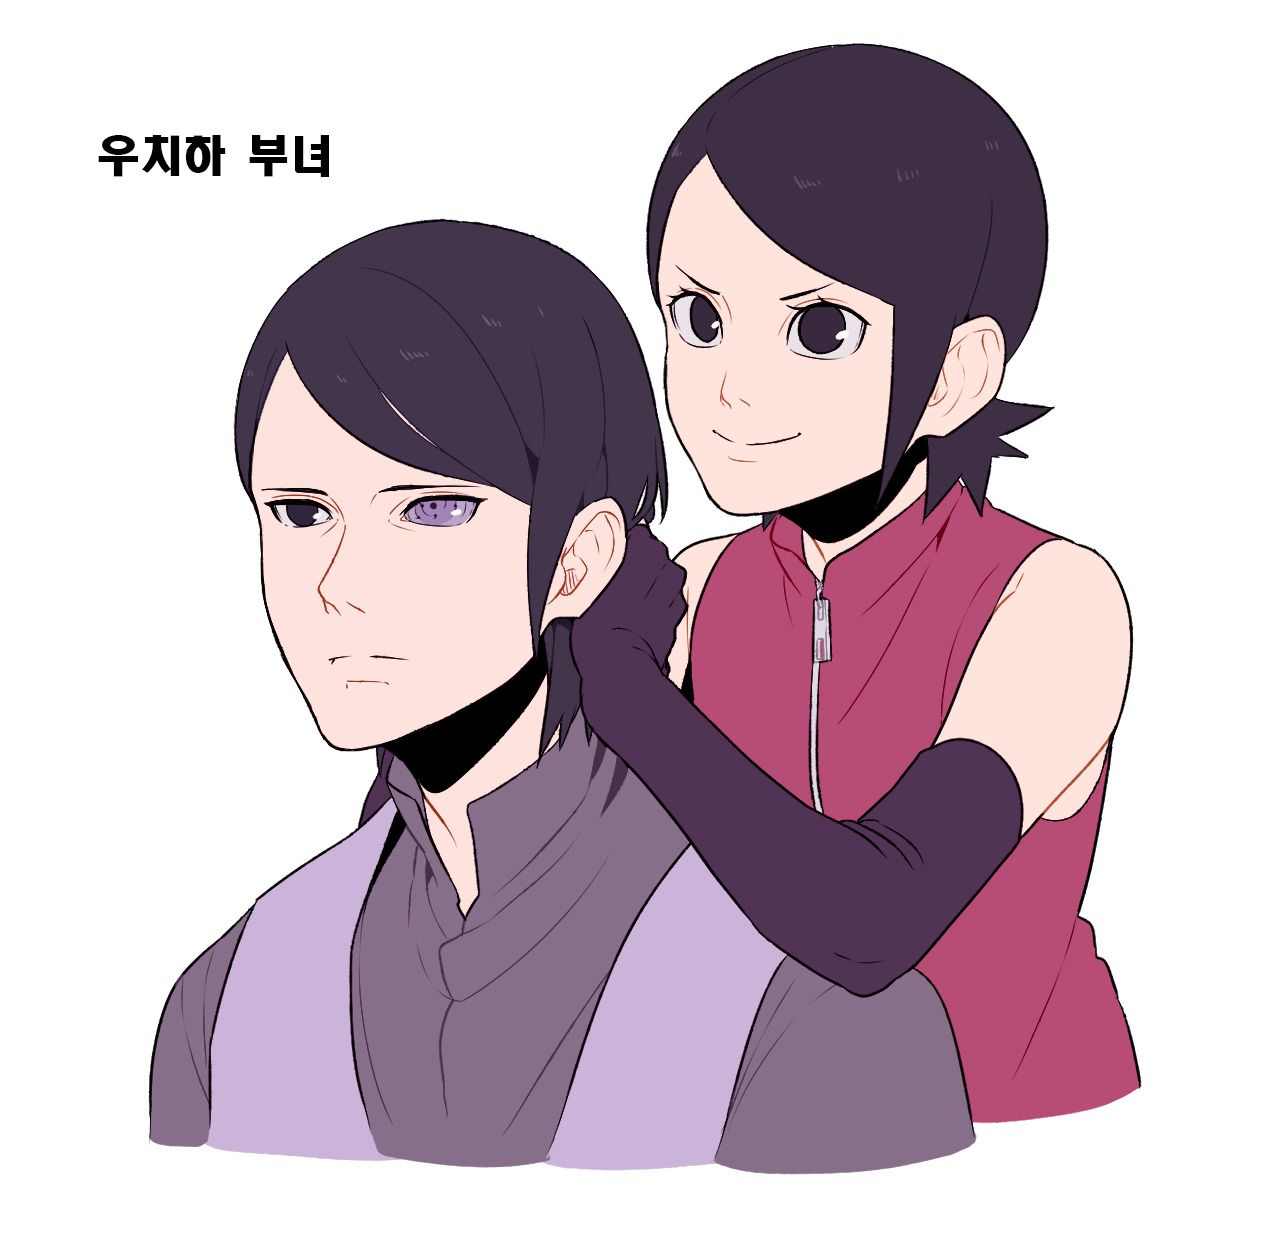 Haha Poor Naruto Is Ignored Again By Sakura: Sasuke, Naruto Sasuke